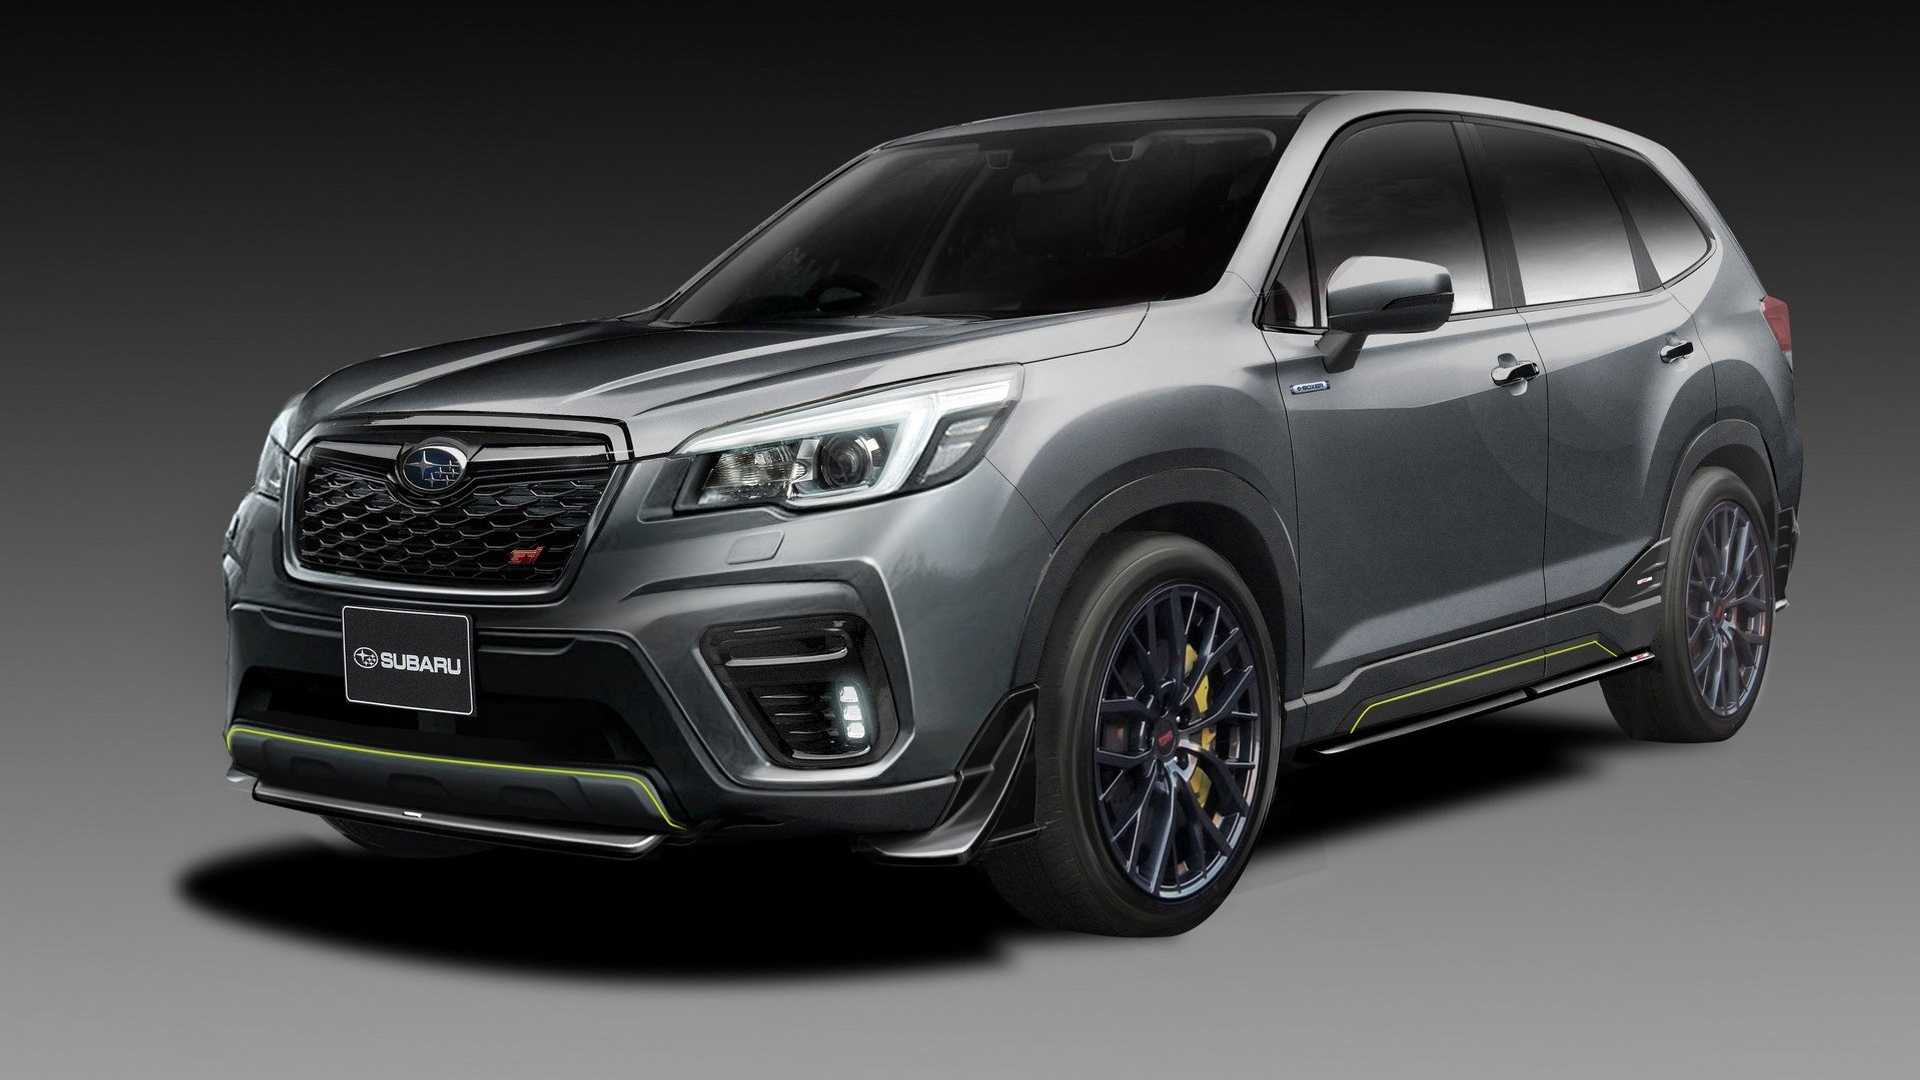 Subaru Latest Models >> Subaru Impreza Sti And Forester Sti Concepts Tease 2019